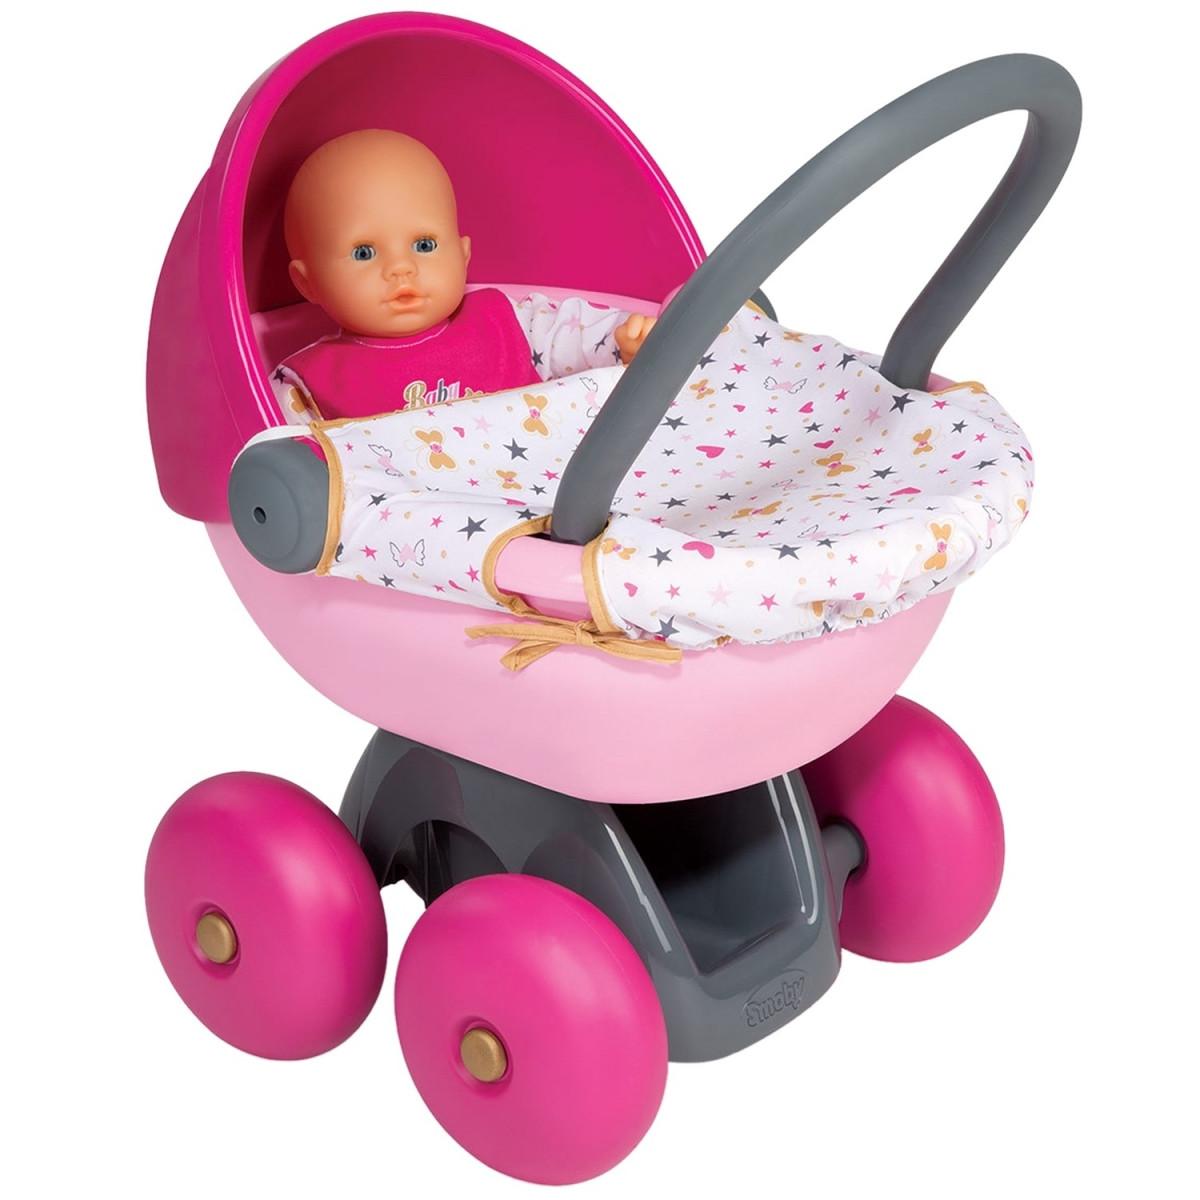 Коляска с люлькой для куклы пупса Baby Nurse Smoby 220312